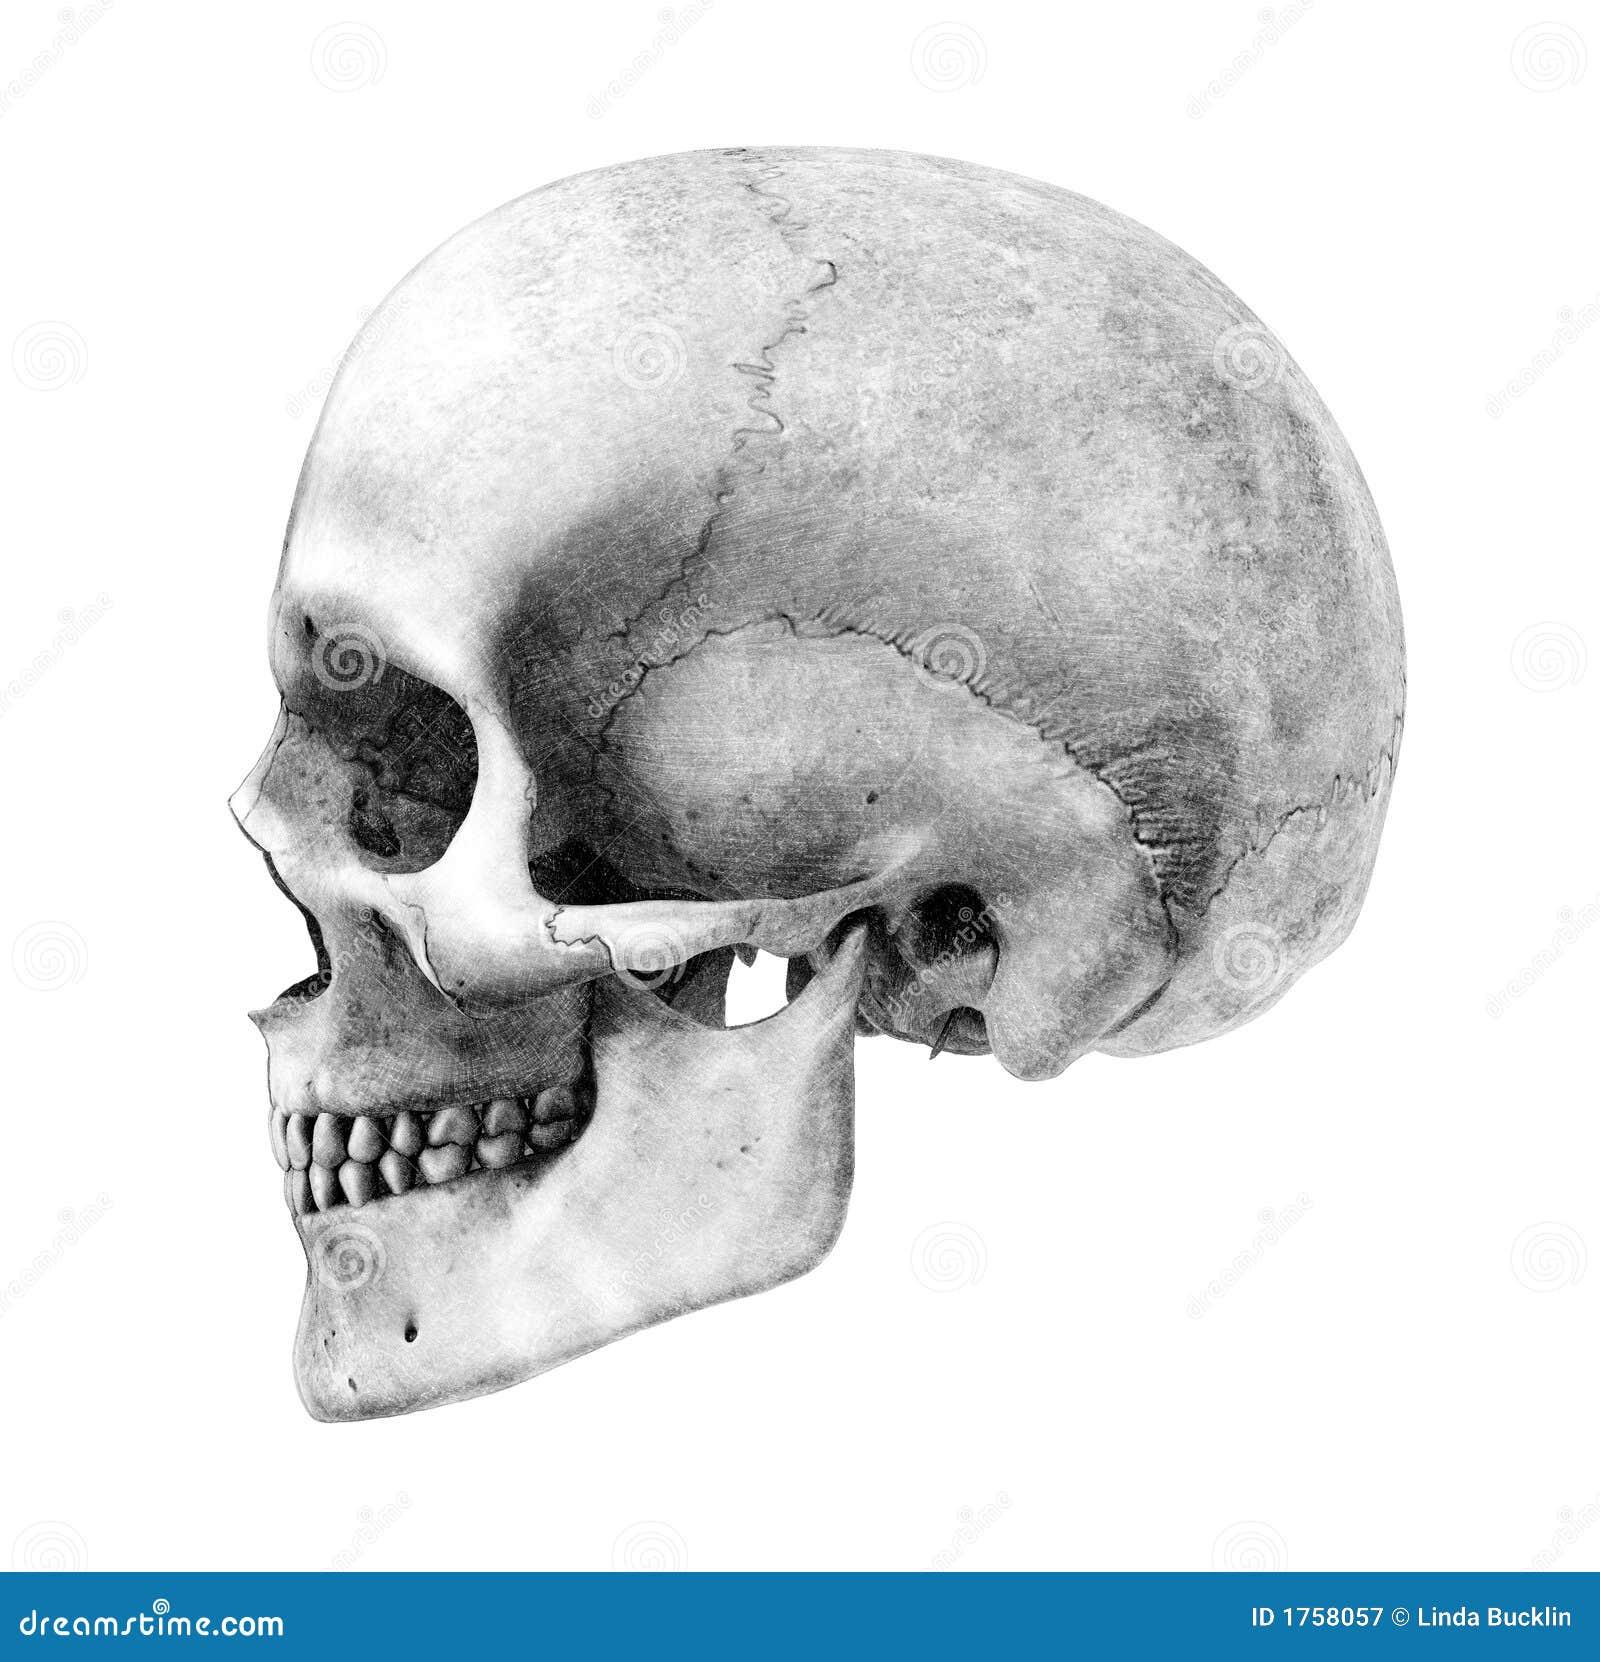 Drawing human ear royalty free stock photography image 25570937 - Royalty Free Stock Photo Drawing Human